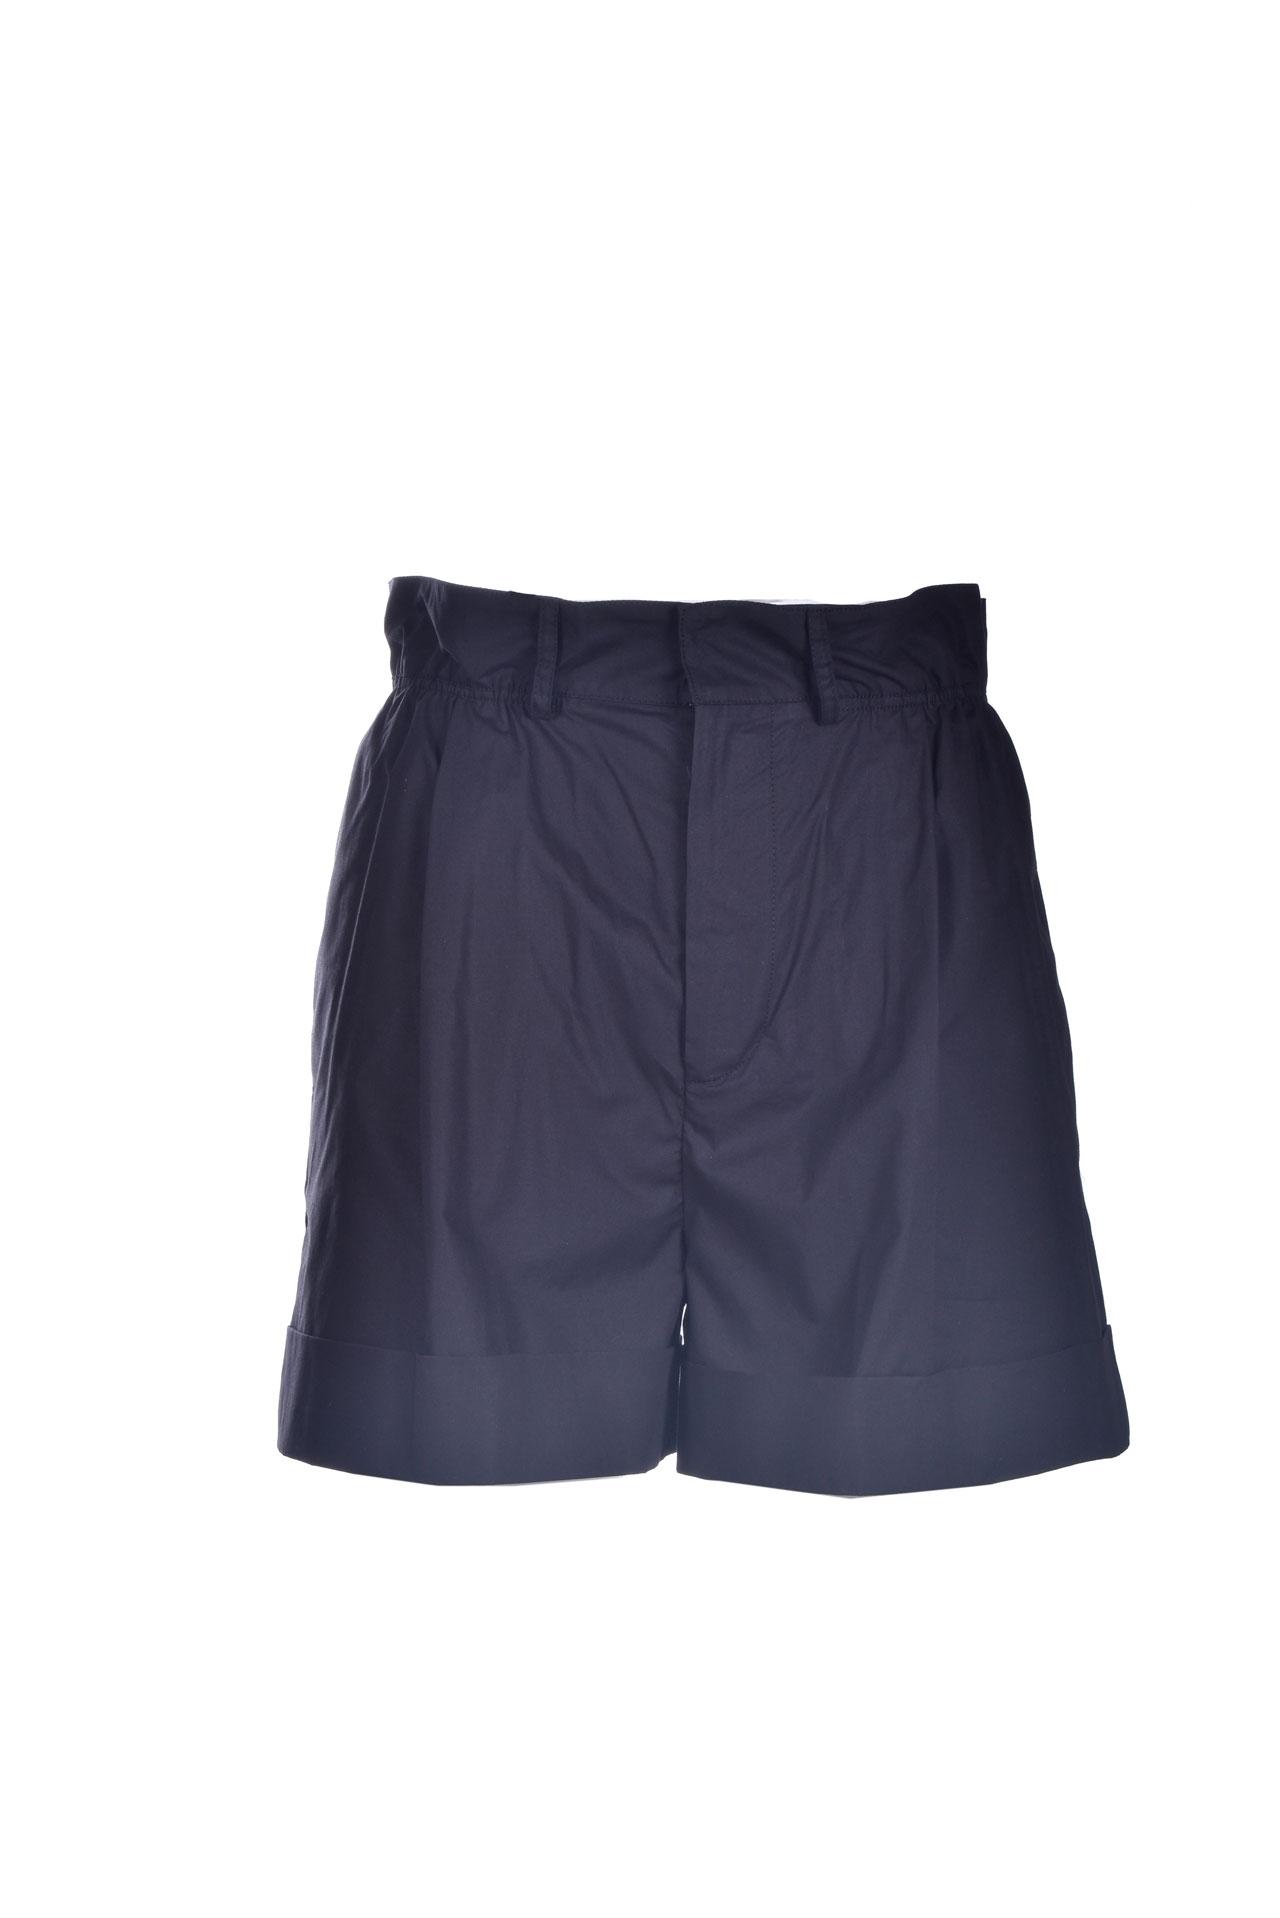 Black high-waisted cotton shorts JUCCA | Shorts | J3314012003